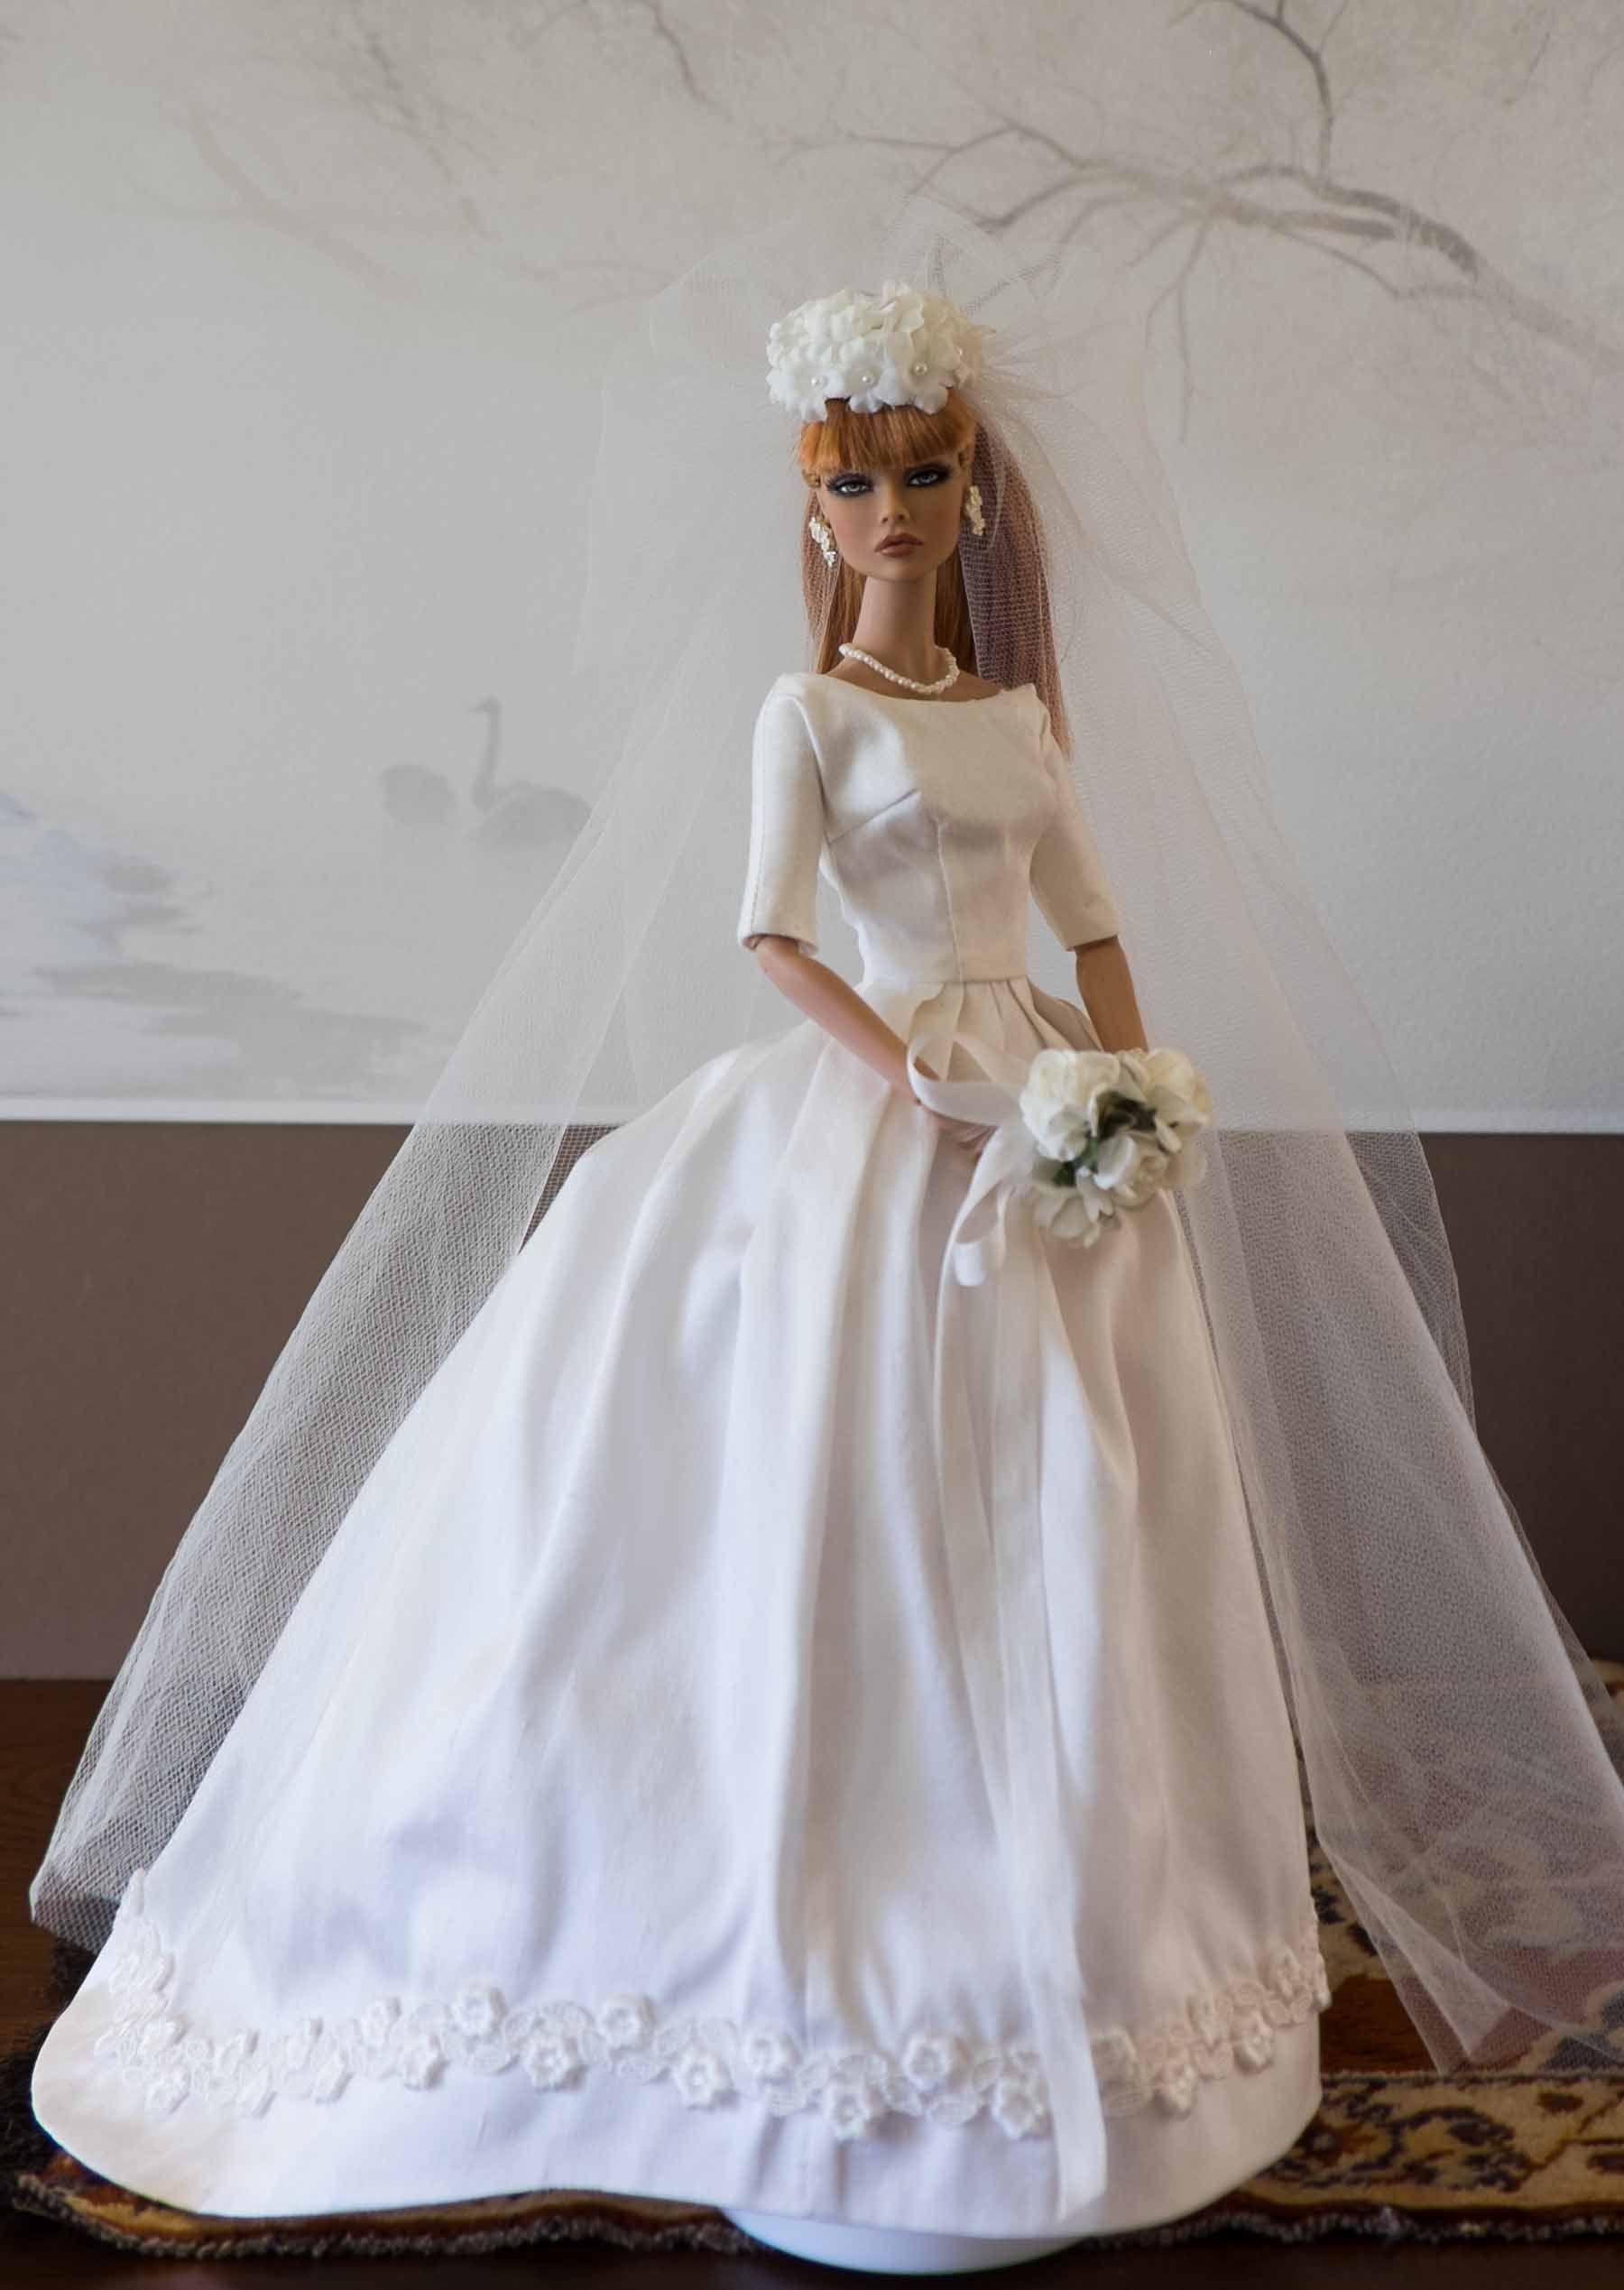 Jackie kennedy wedding dress on display  Pavot Bride devant lowres  Bride Dolls  Pinterest  Dolls